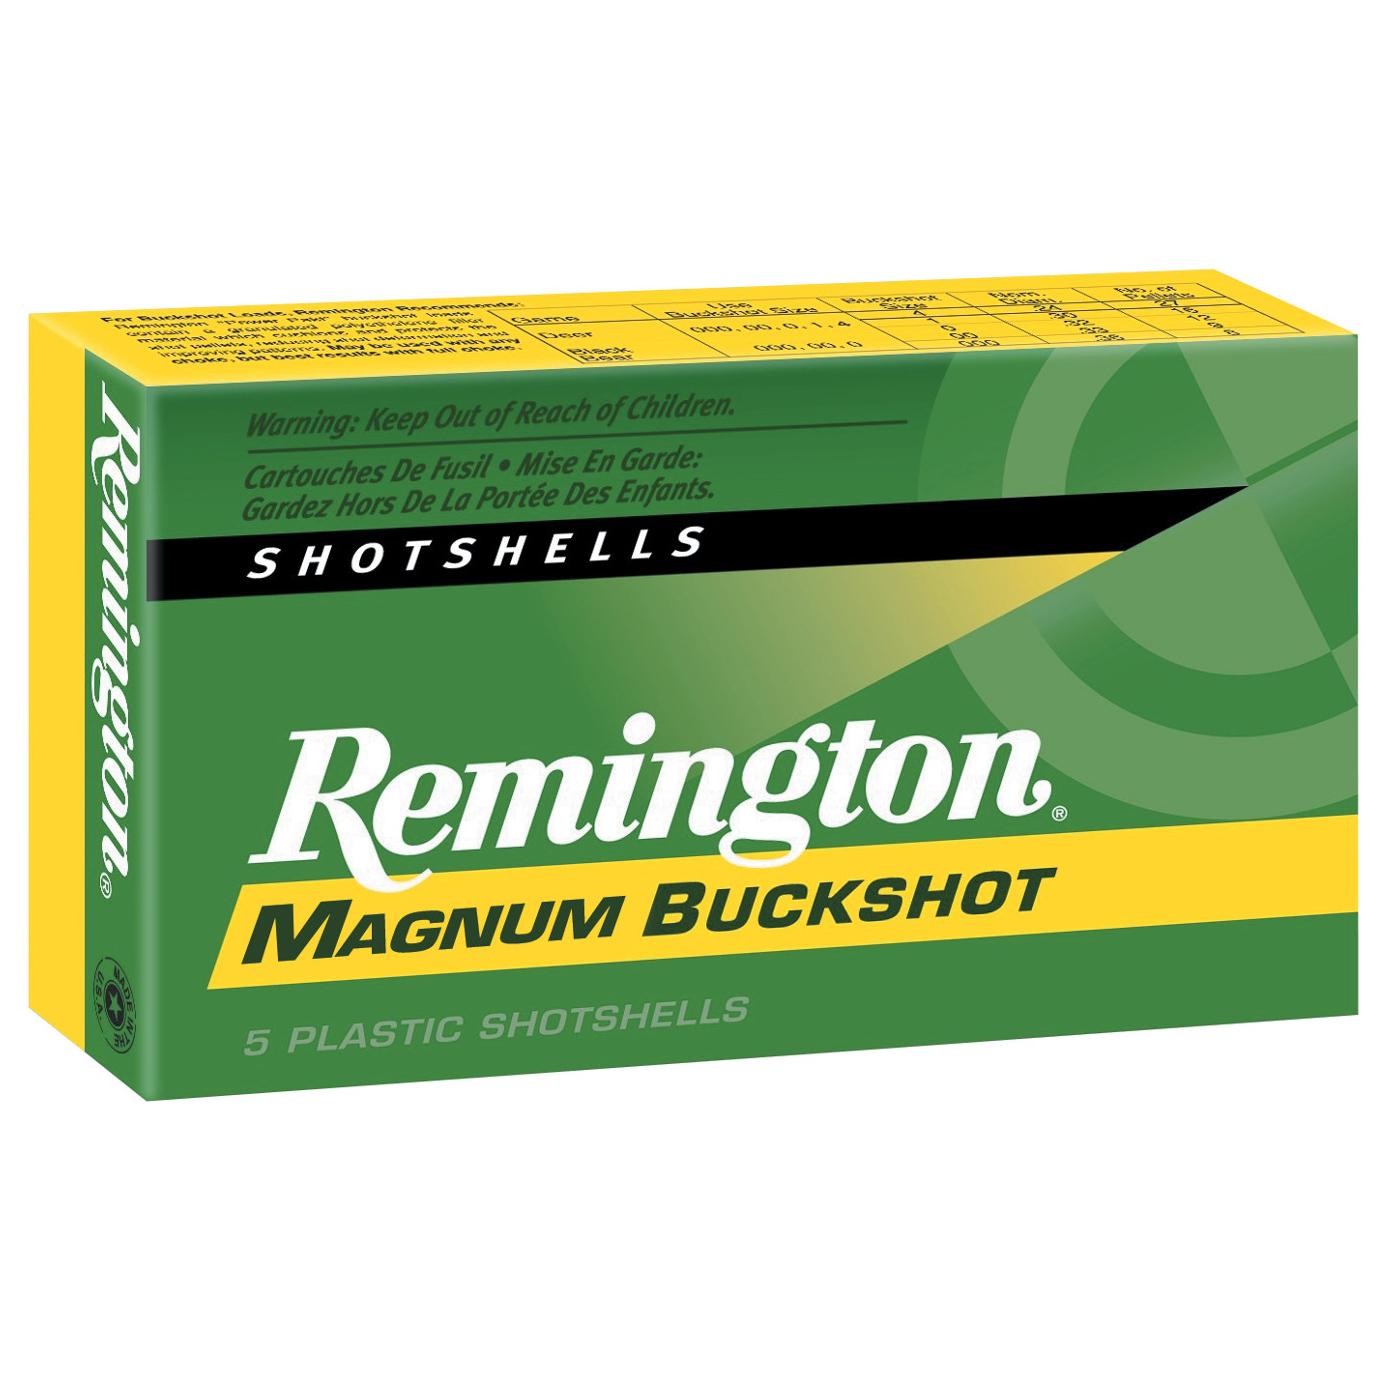 Remington Express Magnum Buckshot, 12-ga, 3″, 15 pellets